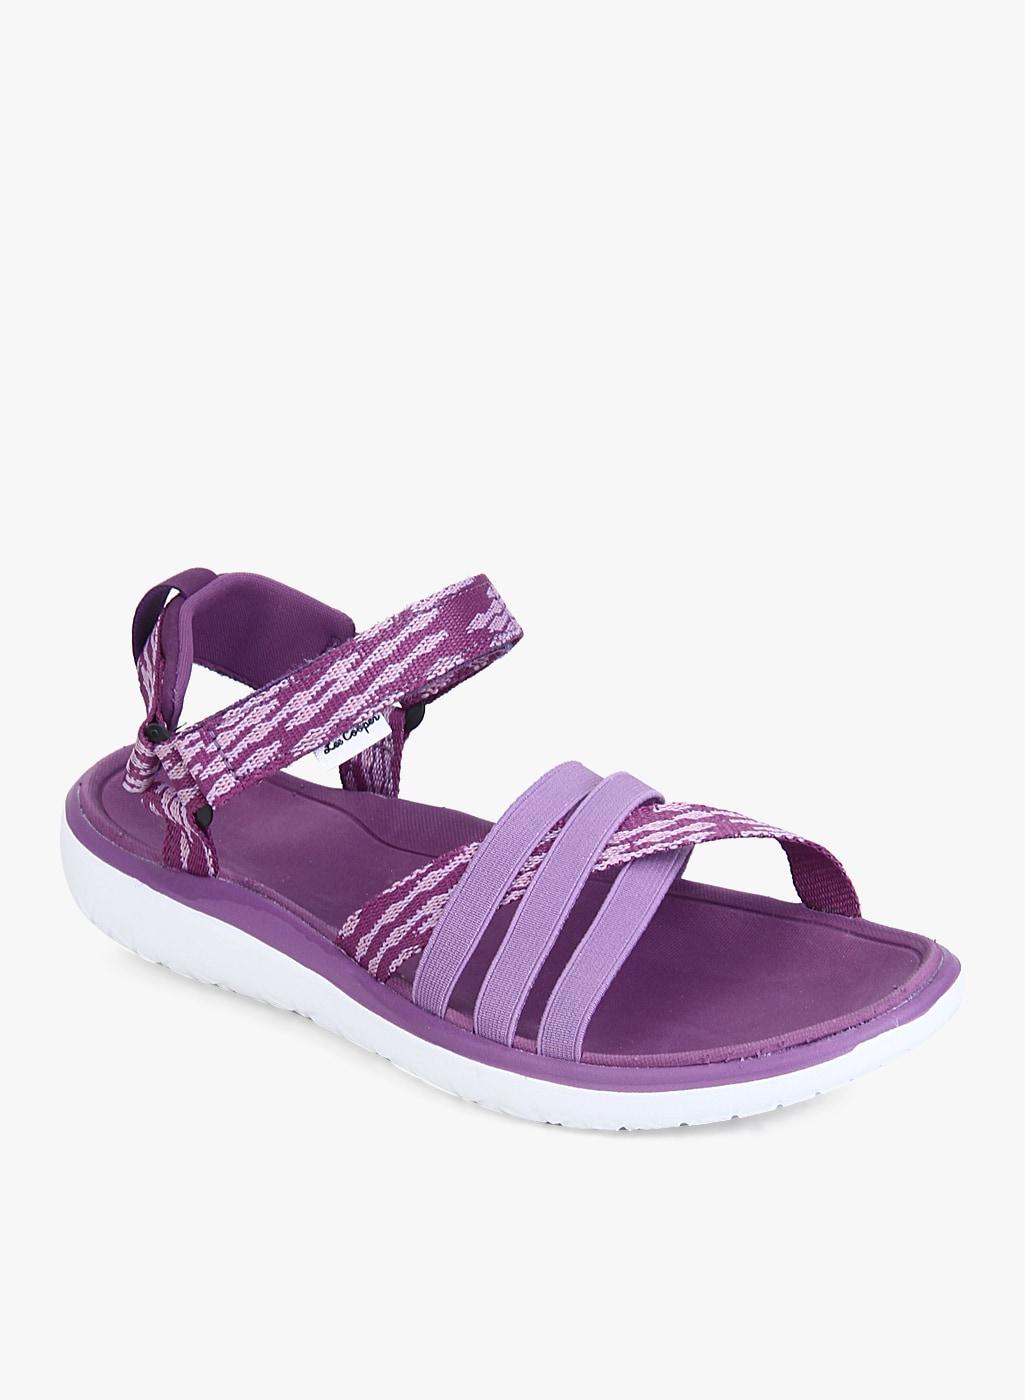 9482d2ddcd5e Women Sarees Sandal Bra - Buy Women Sarees Sandal Bra online in India